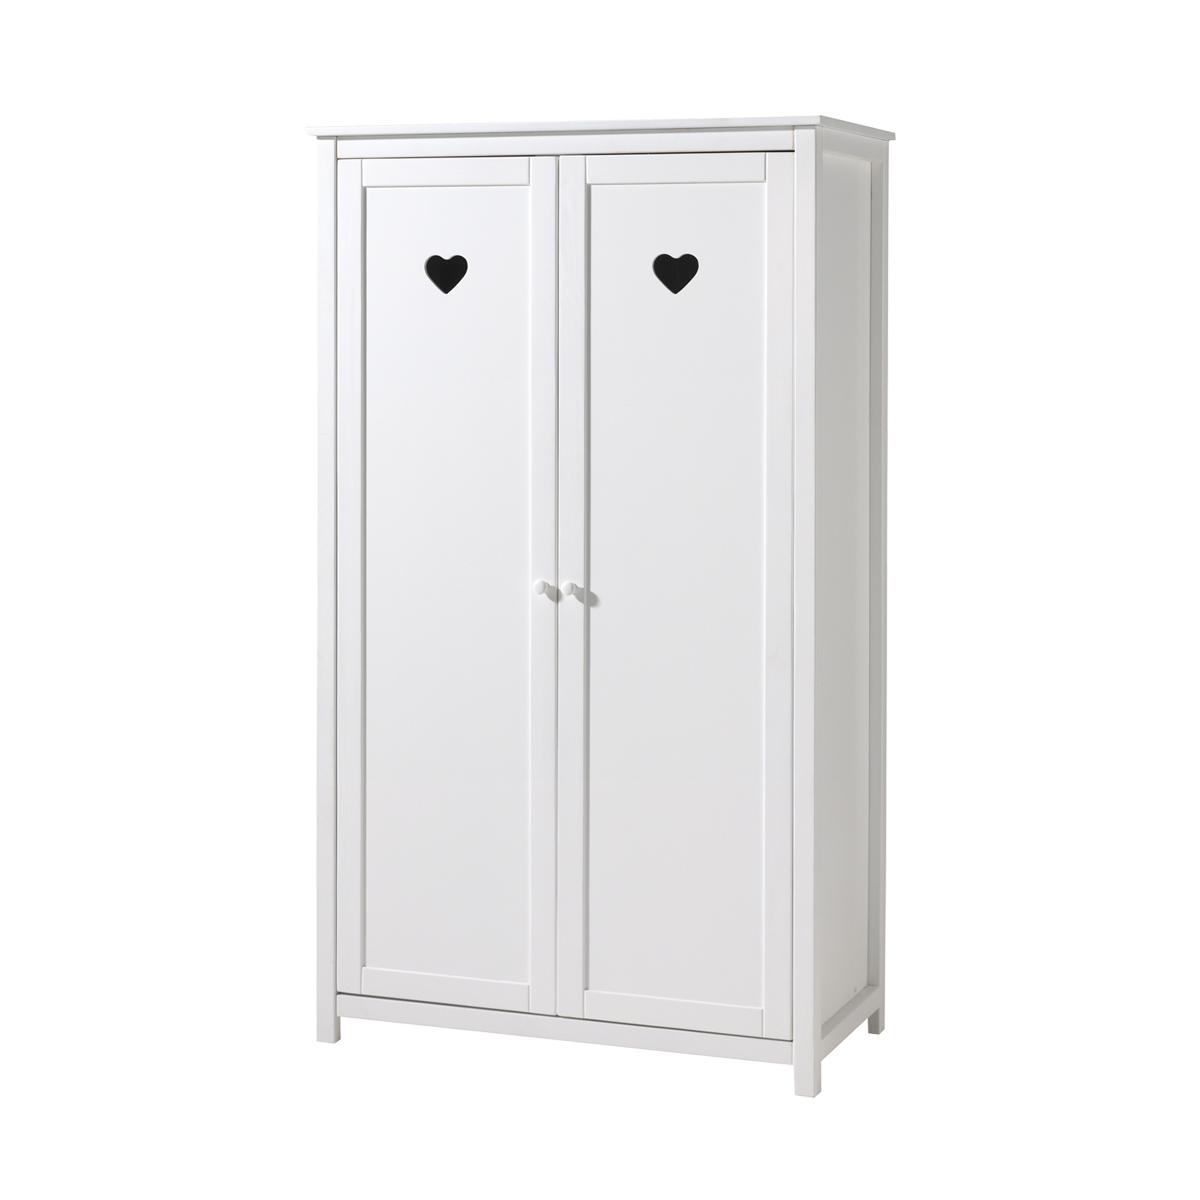 Vipack - Armoire 2 portes Amori - Blanc